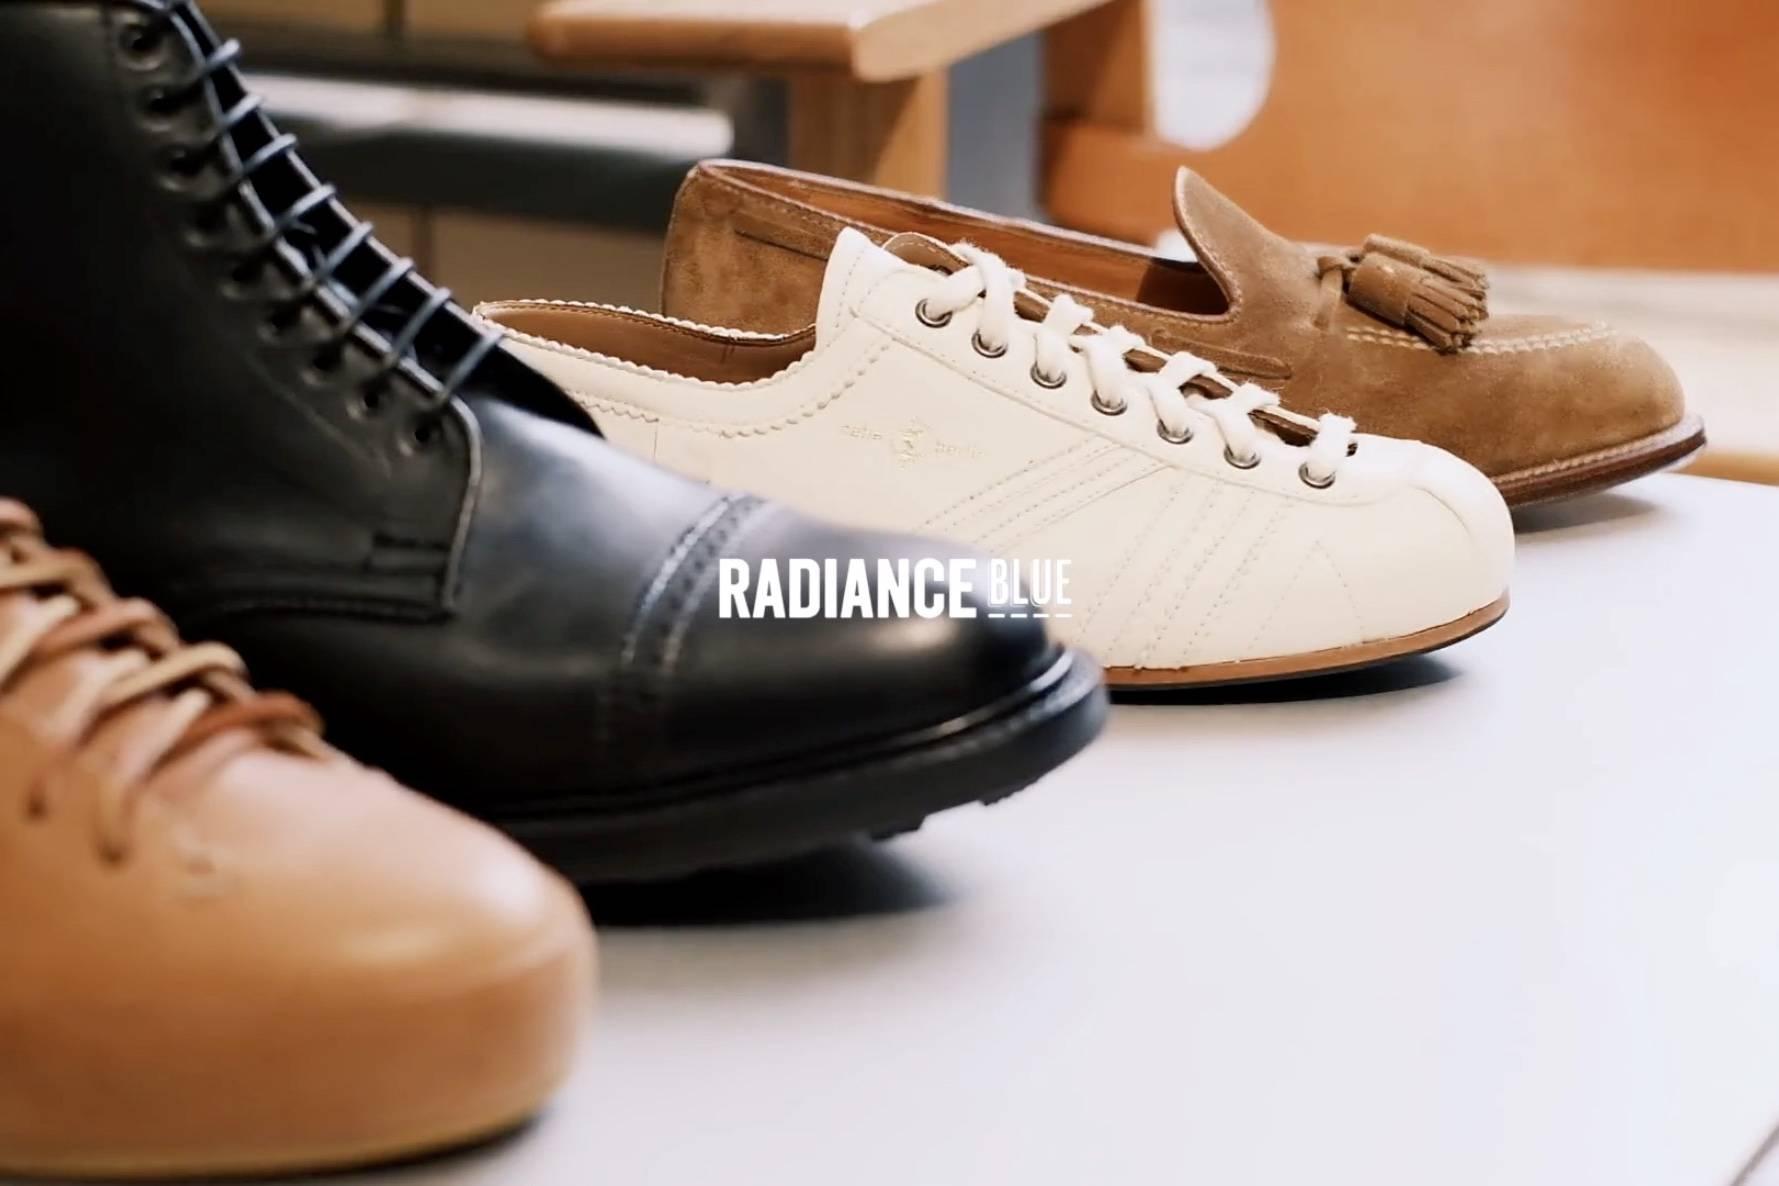 RadianceBlue:魏老板 vs 梁老师,漫谈鞋靴穿搭